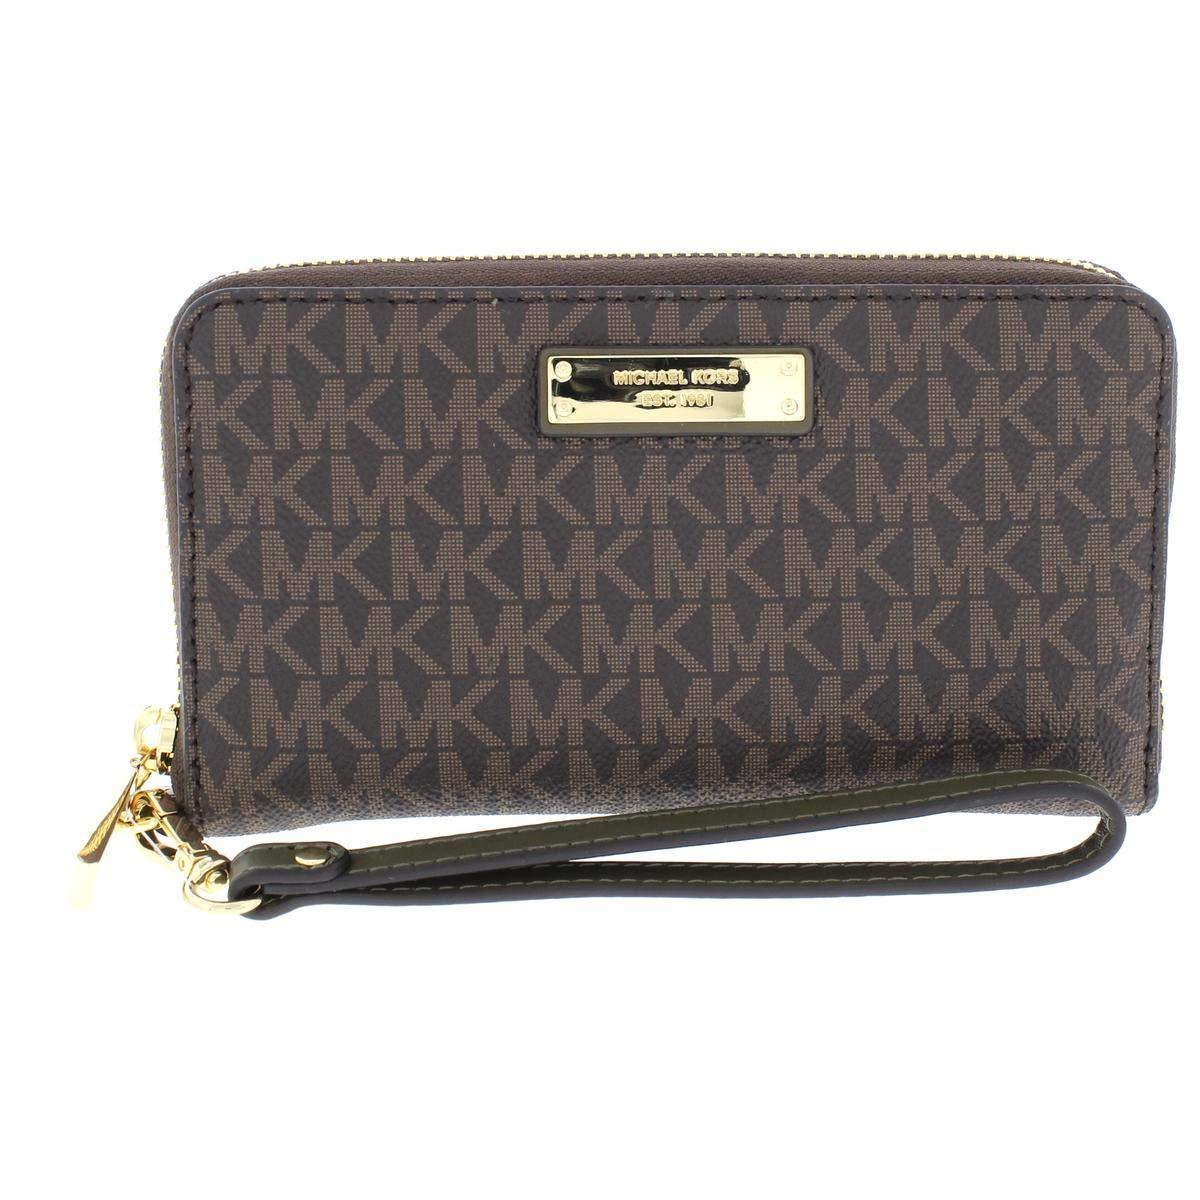 d0fccb182fb8 Michael Kors Womens Jet Set Travel Logo Continental Faux Leather Wristlet  Wallet: Handbags: Amazon.com